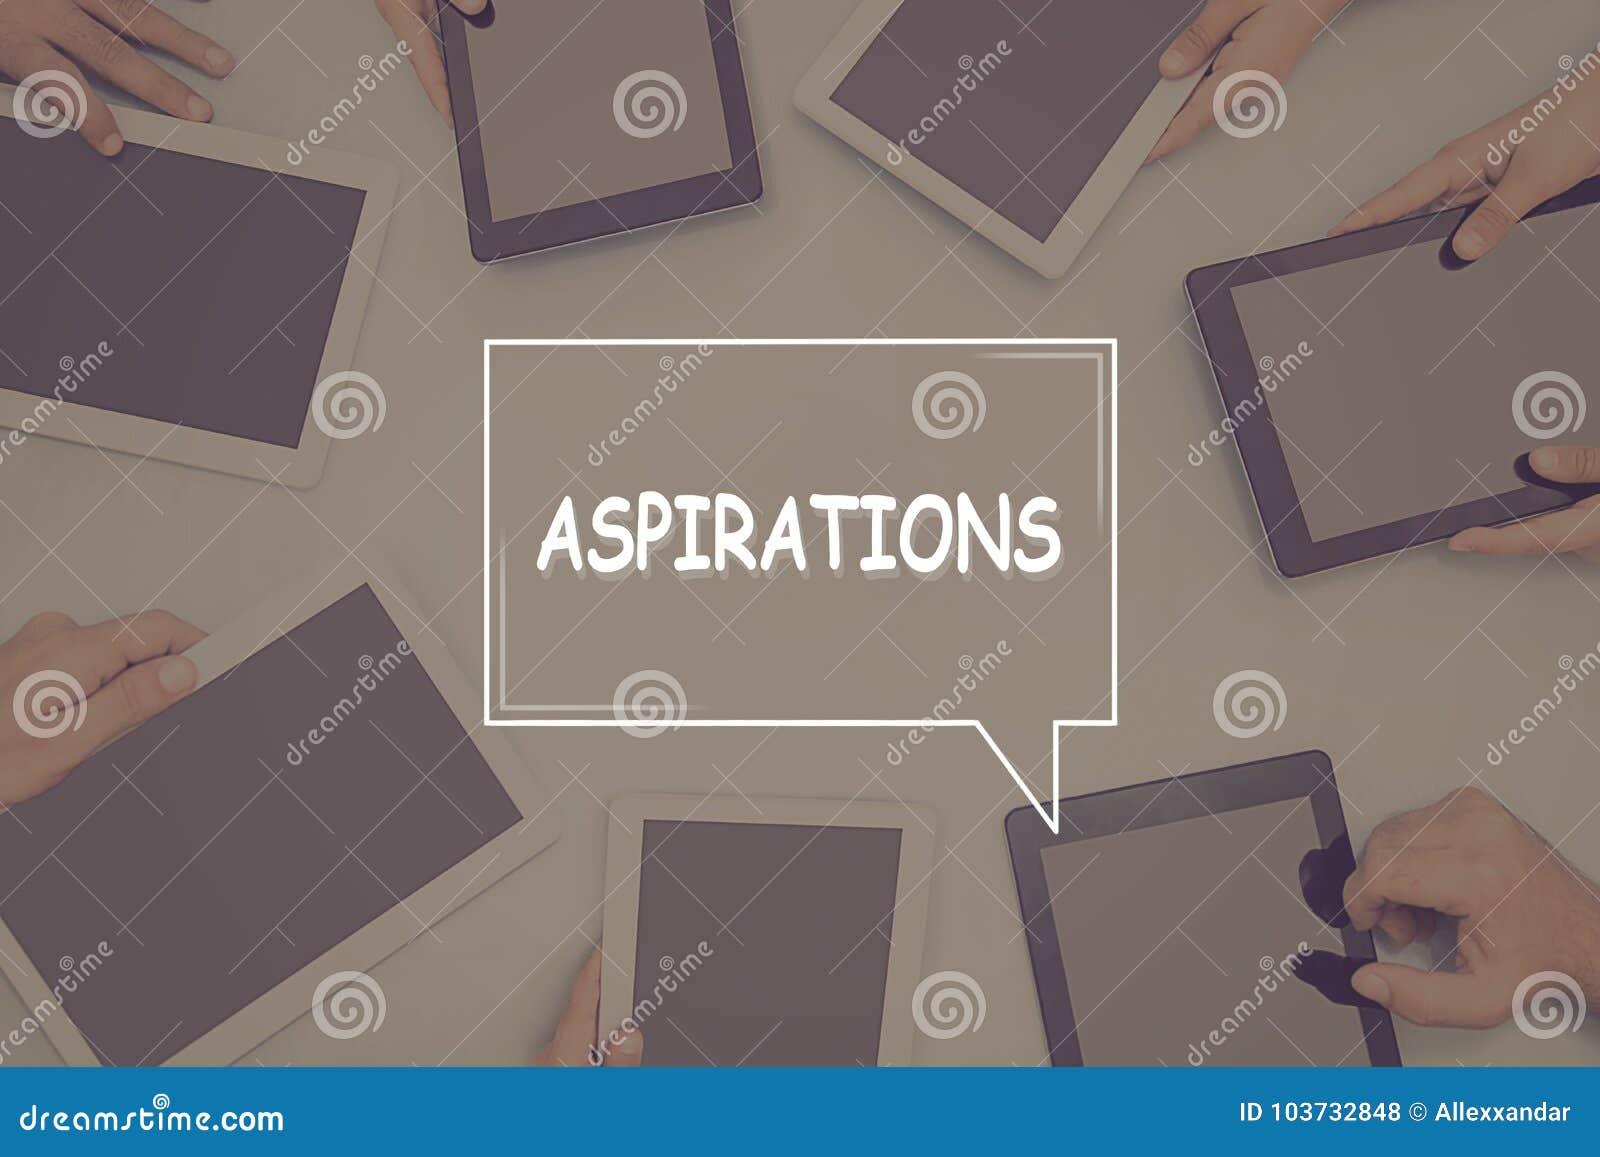 ASPIRATIONS CONCEPT Business Concept.